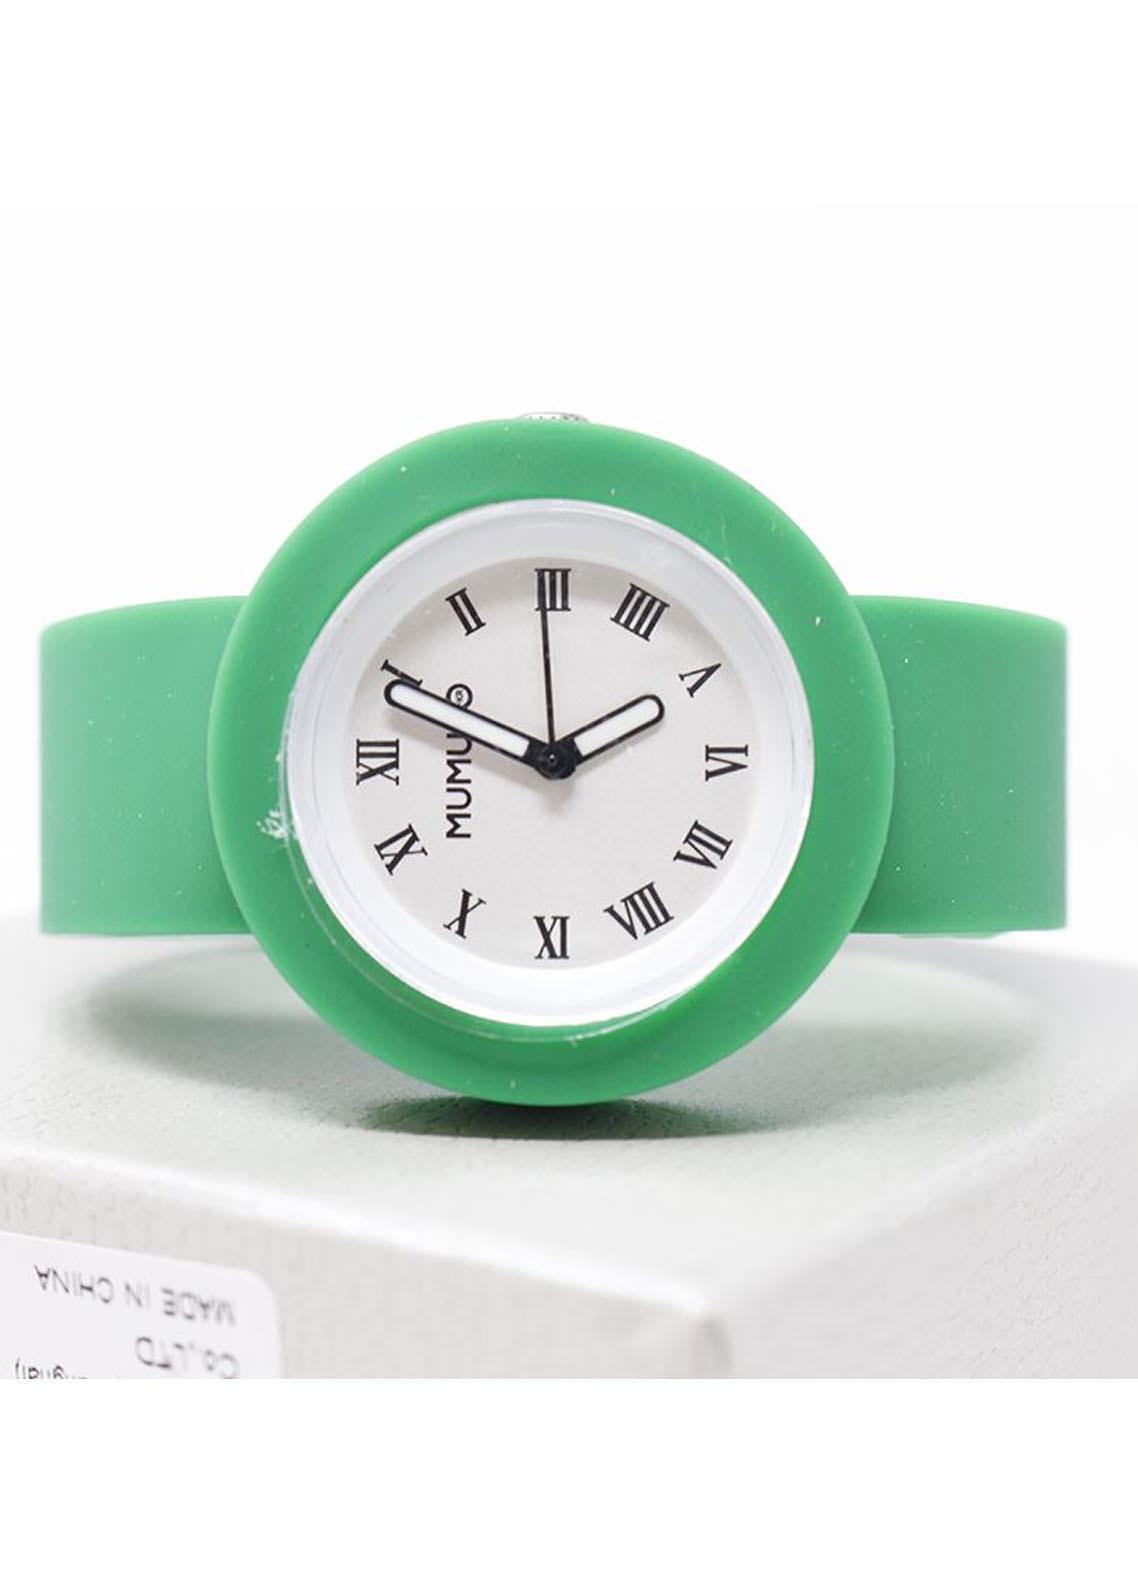 Mumuso Fashion Silicone Watch-green belt (M)roman capitals watch